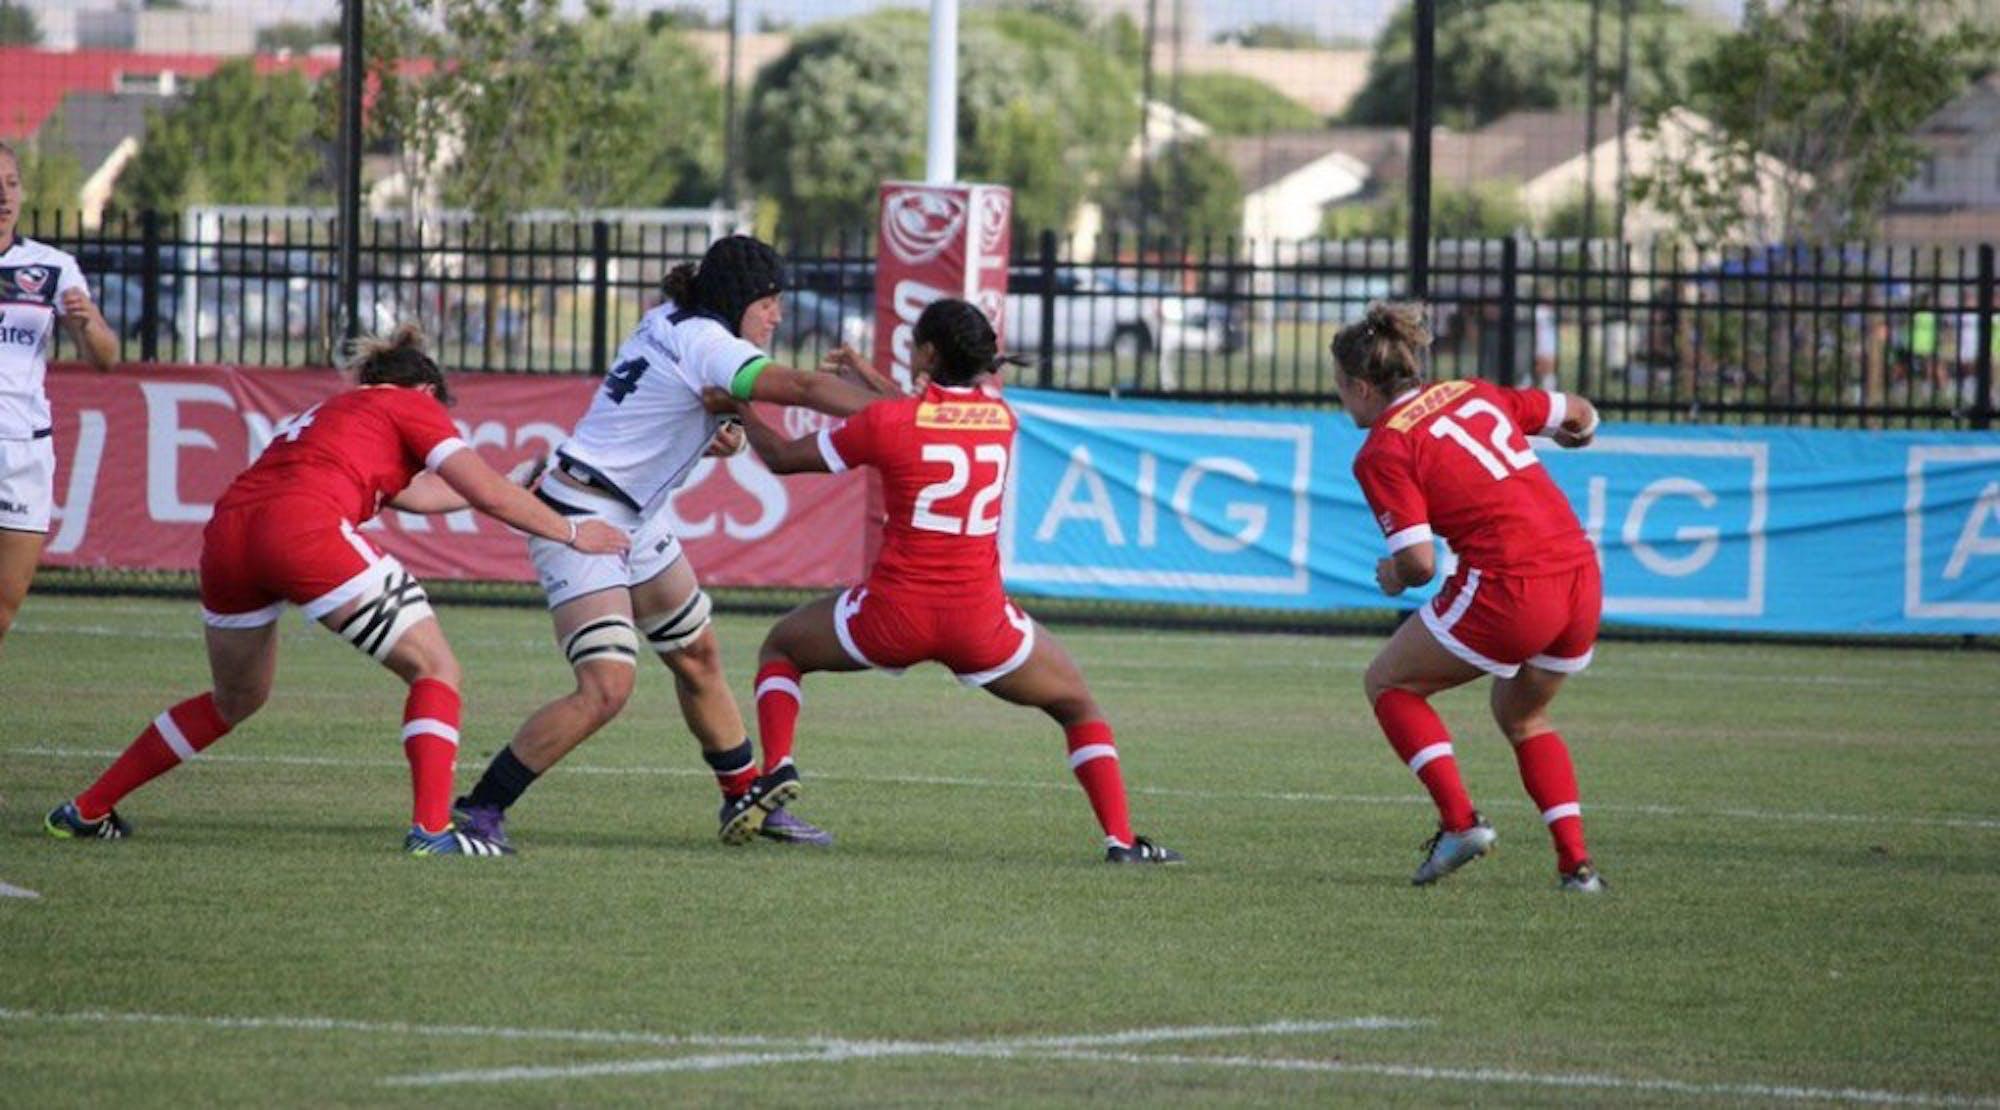 sports_rugby1web_courtesy1038x576